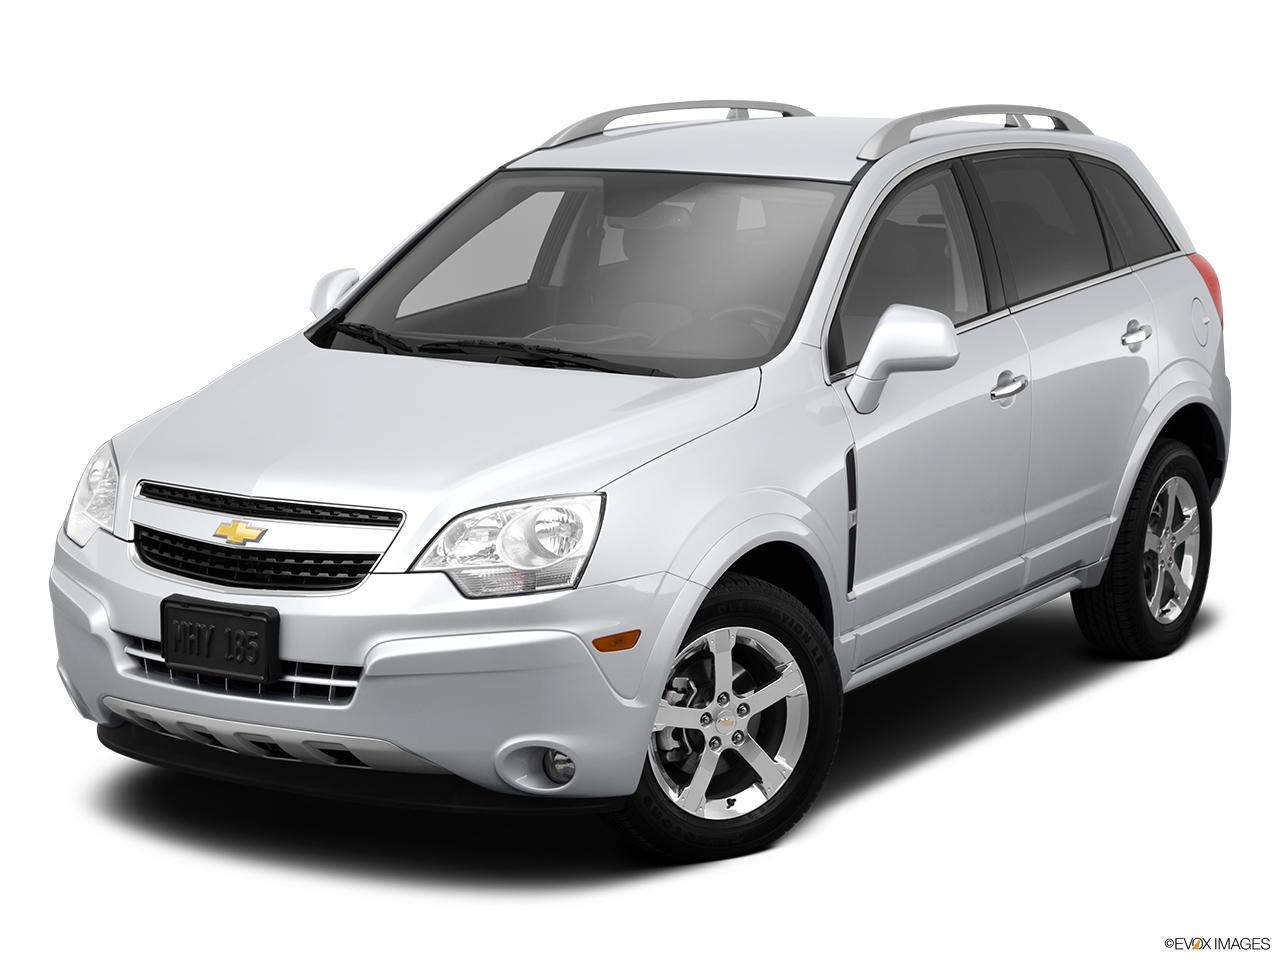 All Chevy chevy captiva horsepower : 8867_st1280_046.jpg